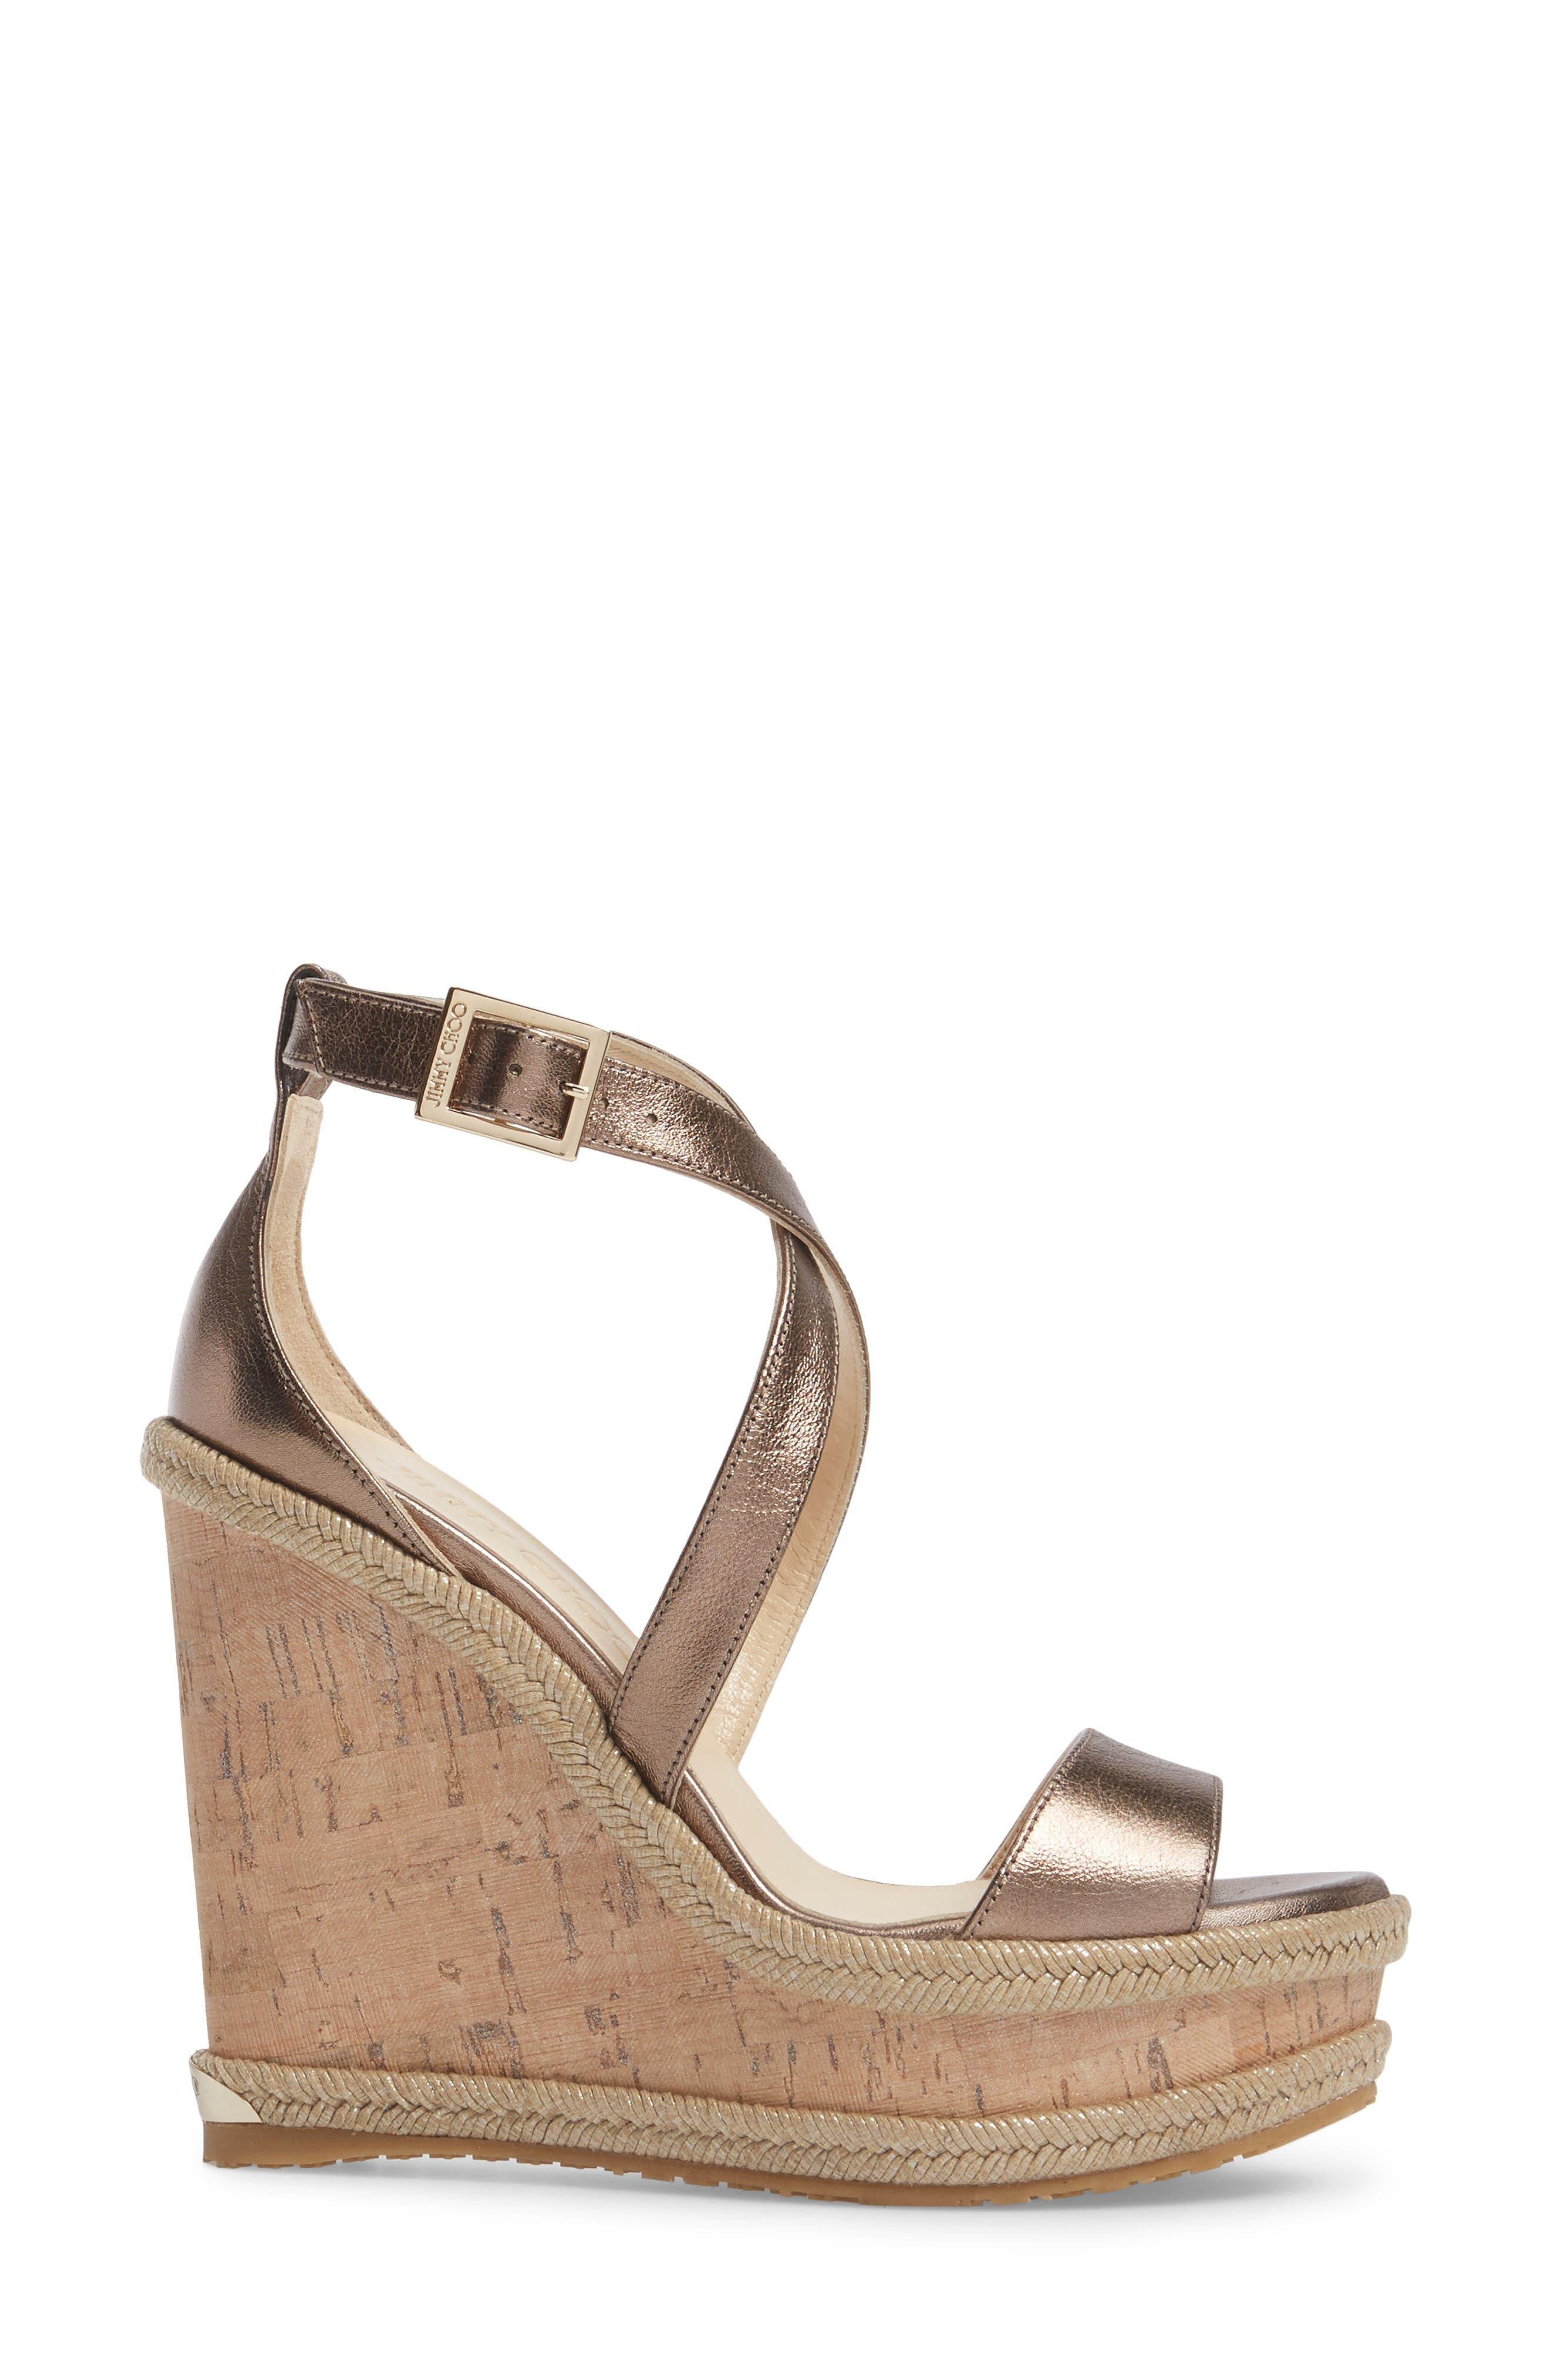 Portia Wedge Platform Sandal,                             Alternate thumbnail 3, color,                             710